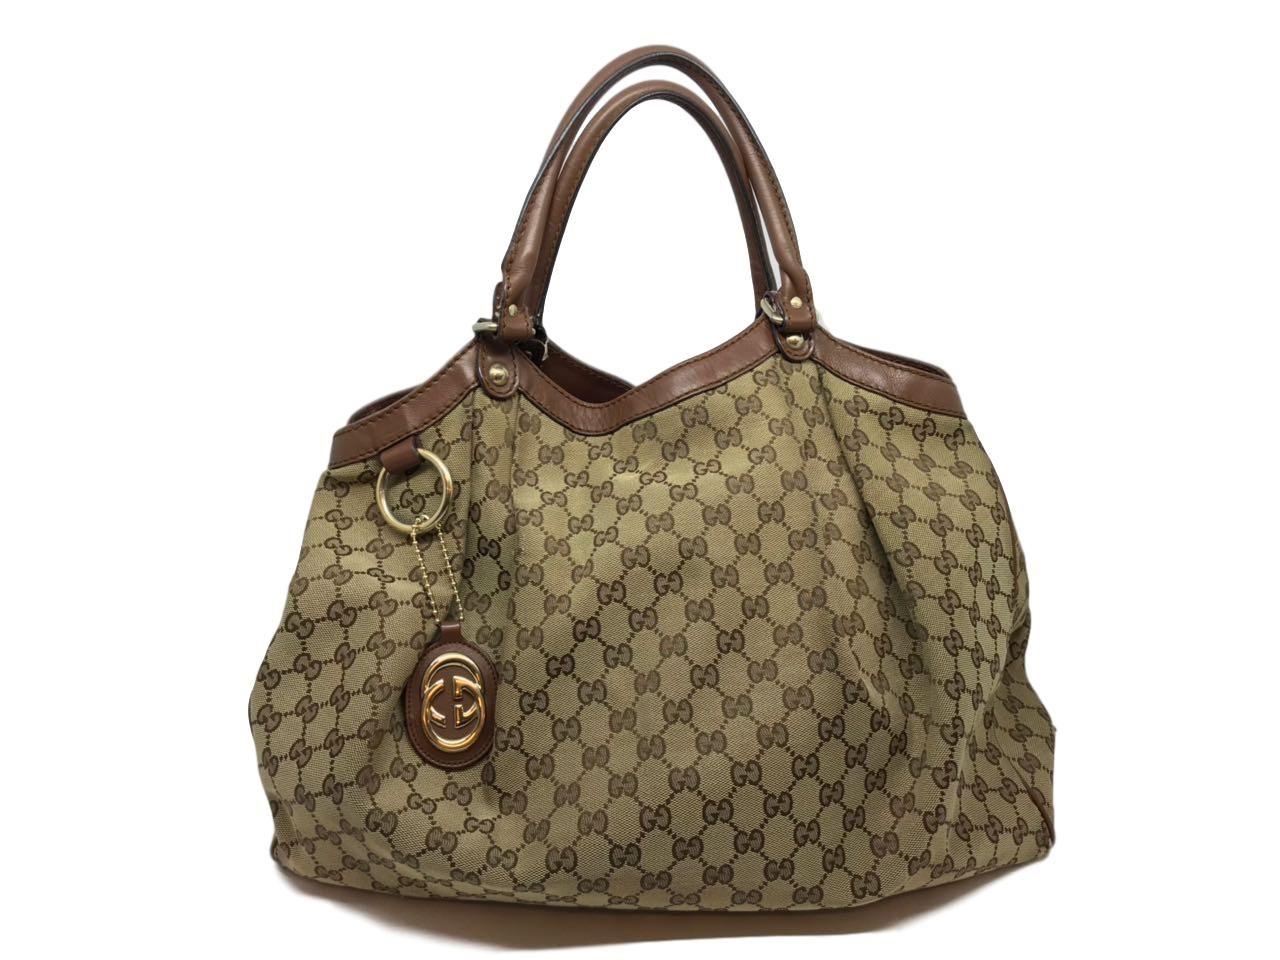 3b3ad06ea Bolsa Gucci Monograma Friso em couro - Paula Frank | Bolsas de luxo ...